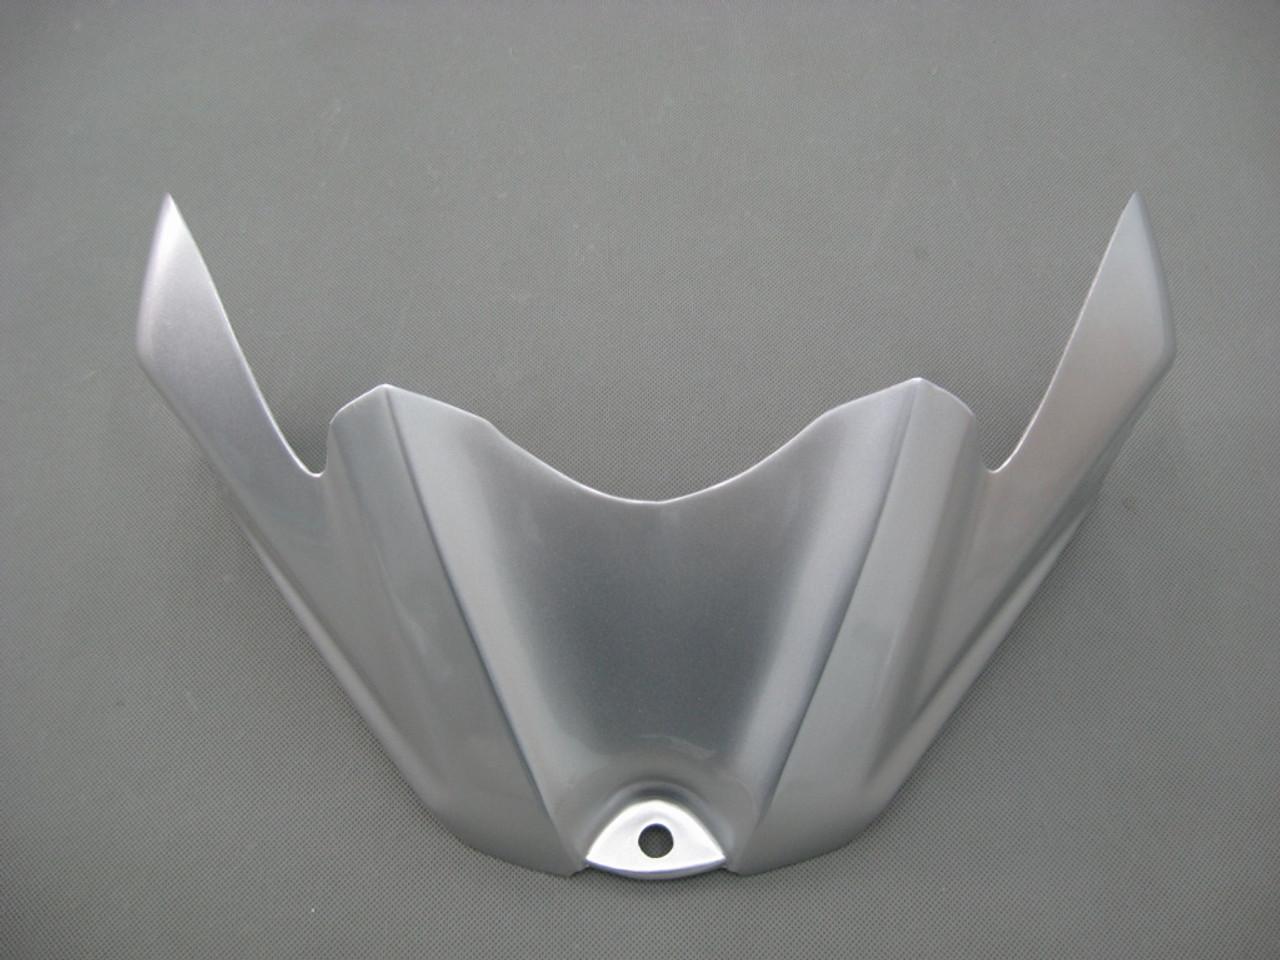 Fairings Suzuki GSXR 600 750 Silver White GSXR Racing  (2008-2009-2010)